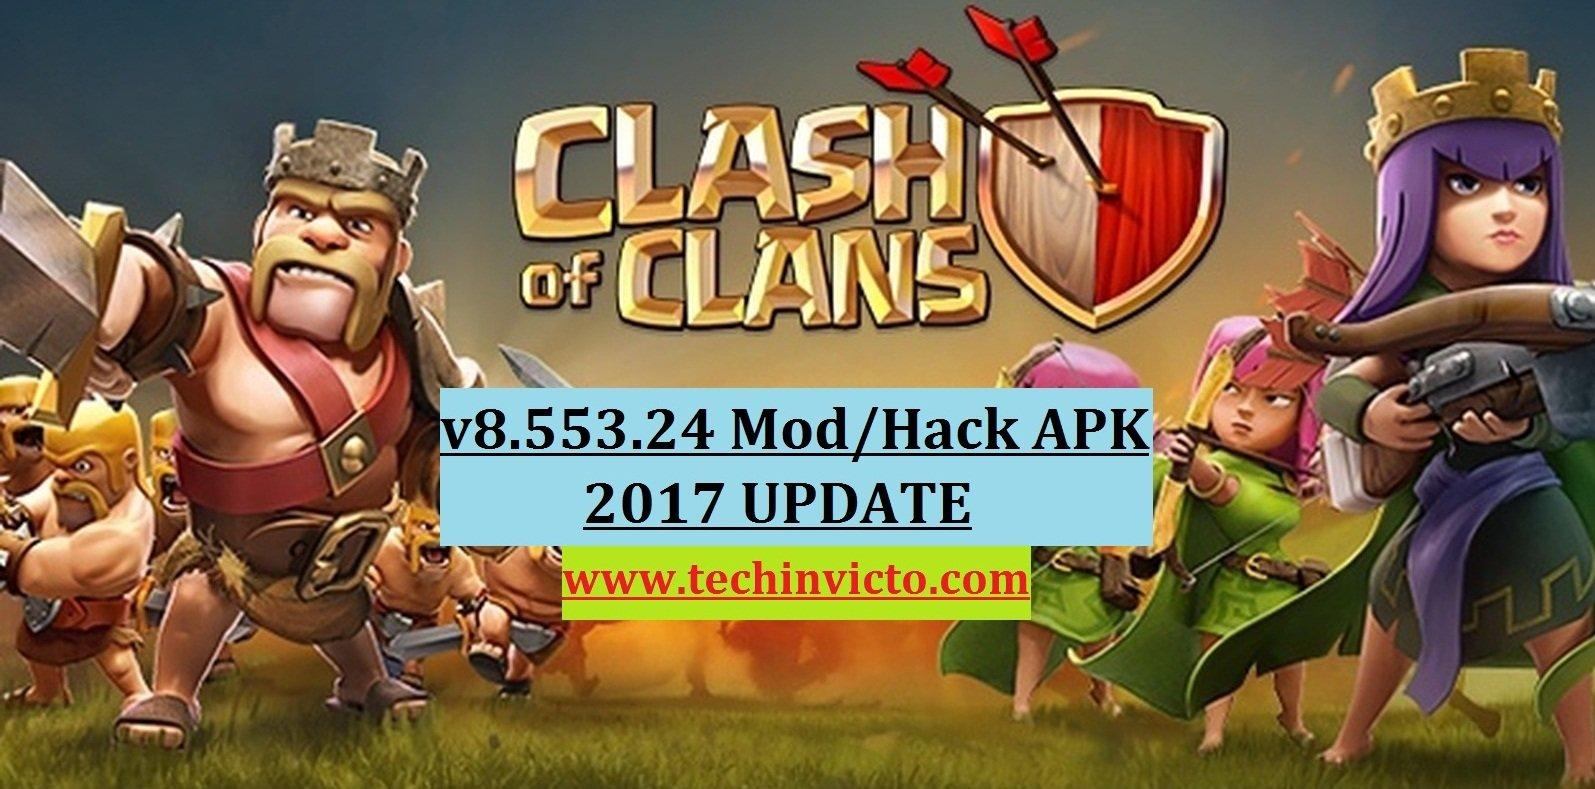 Download Clash of Clans 8 553 24 Mod/Hack APK 2017 UPDATE